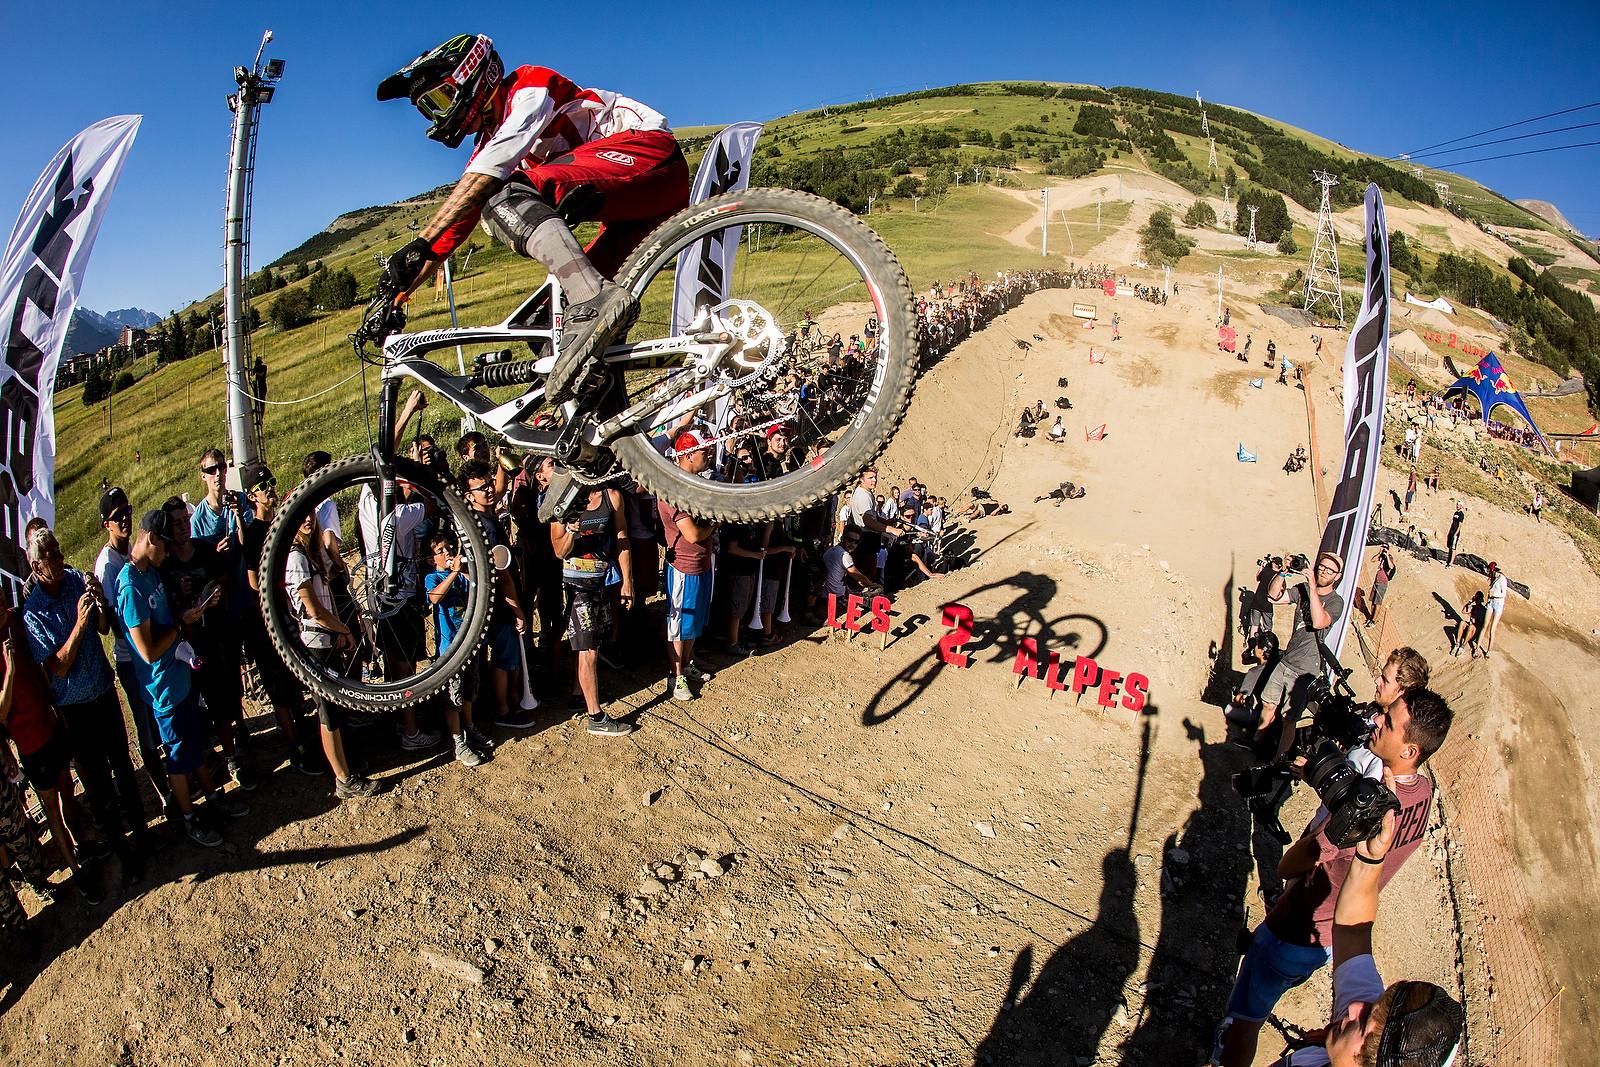 Bryan Regnier, Whip Off European Champs, Crankworx L2A - Whip Off European Champs, Crankworx L2A - Mountain Biking Pictures - Vital MTB